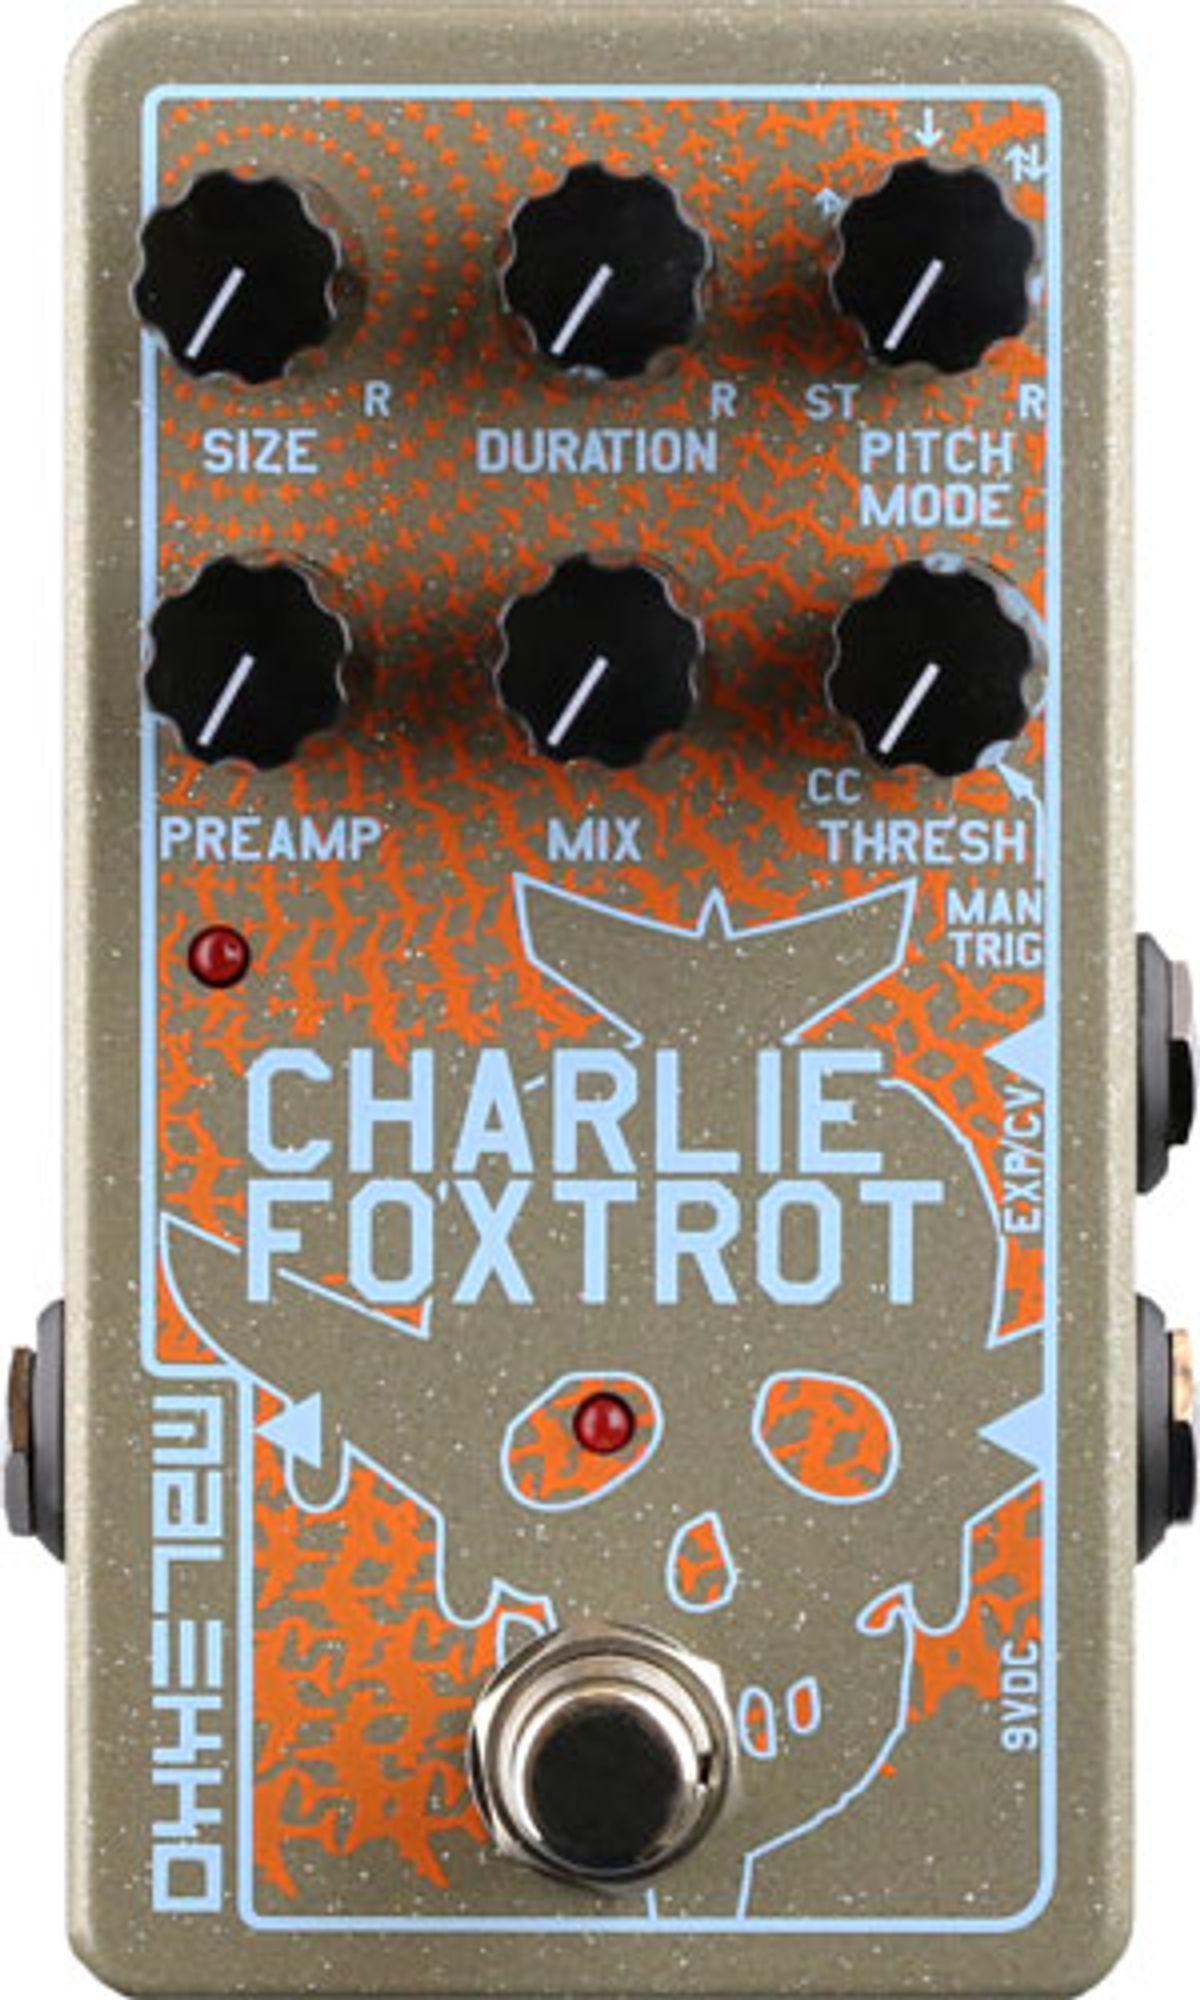 Malekko Introduces the Charlie Foxtrot